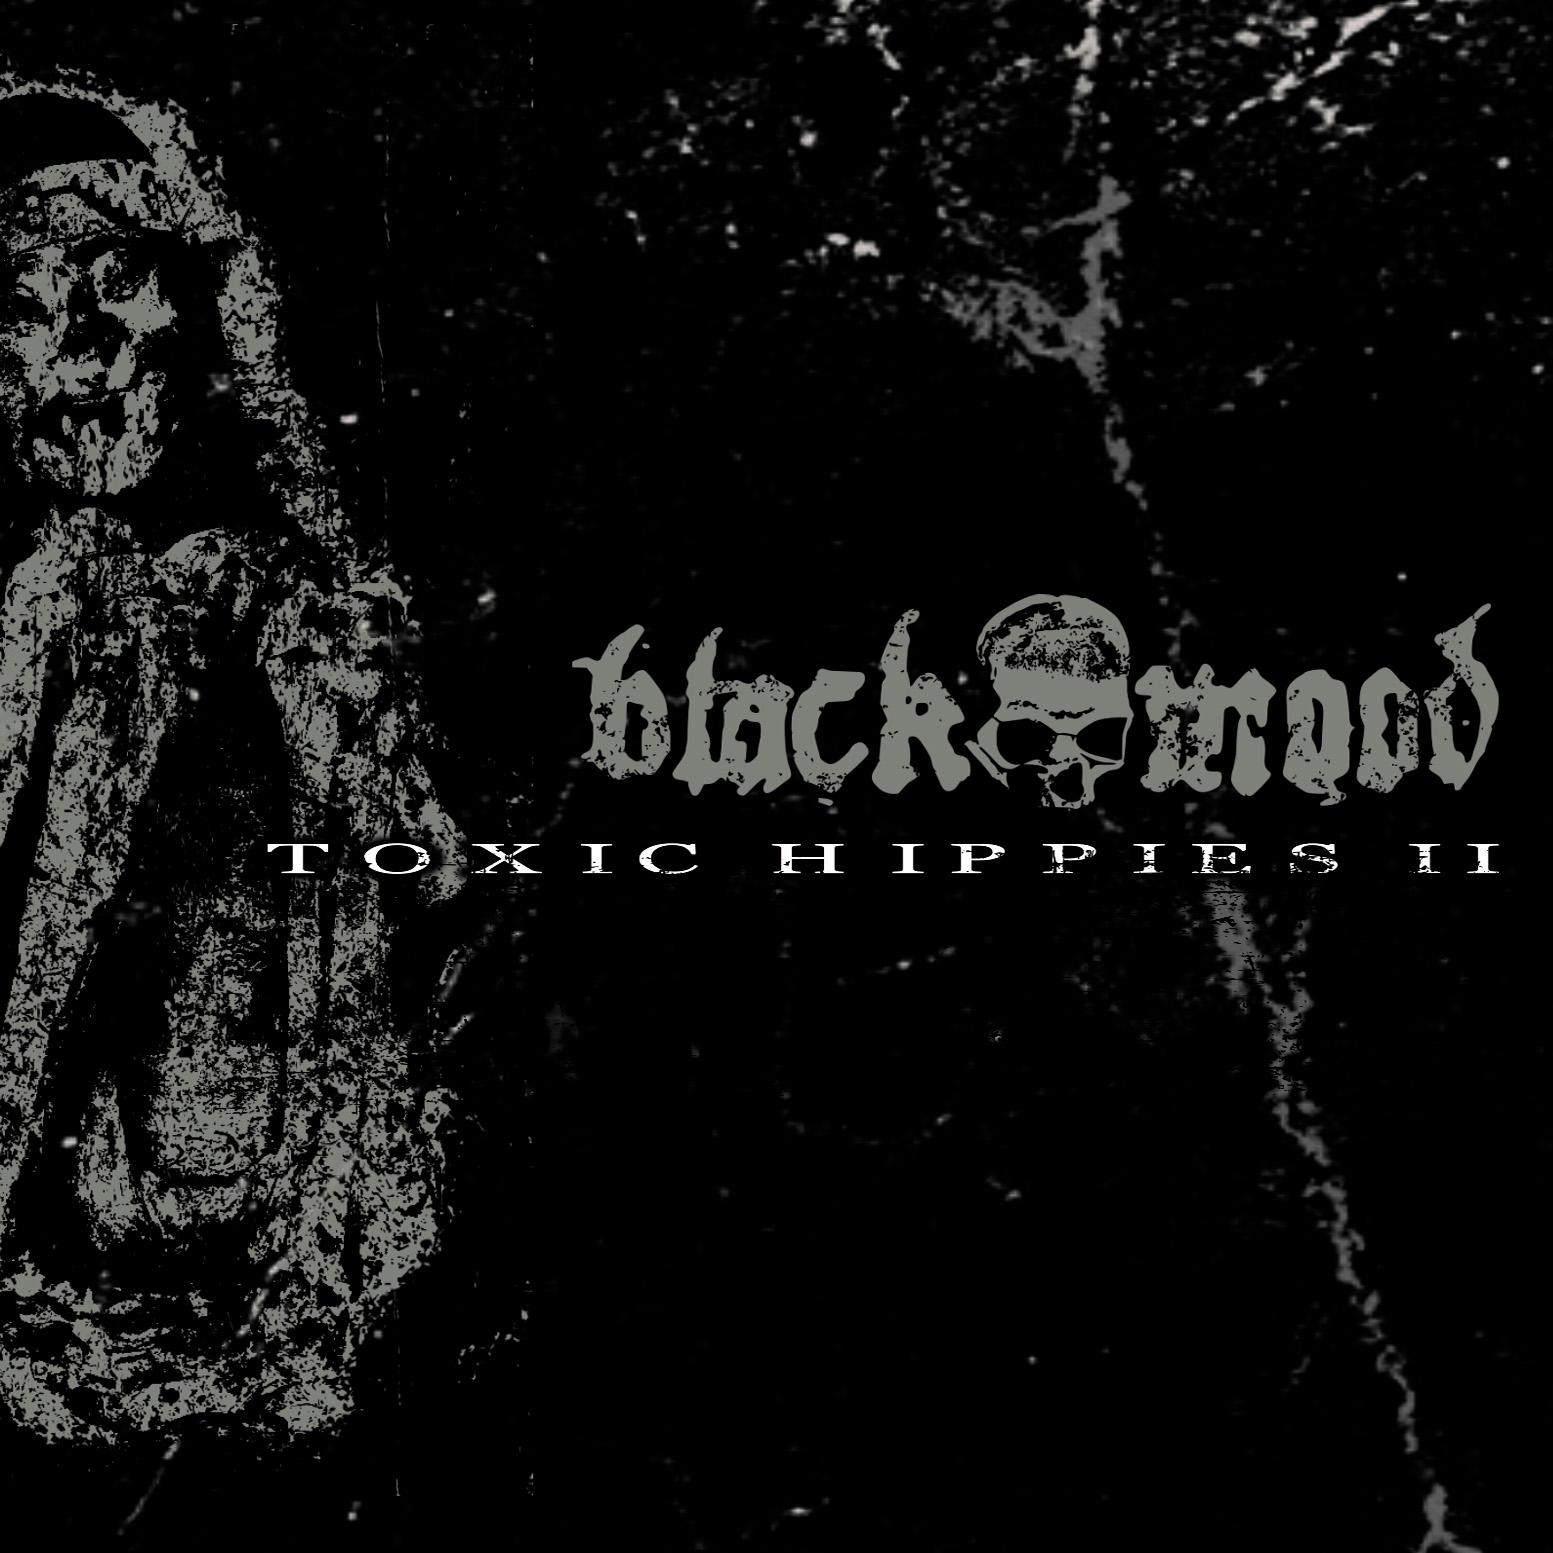 black-mood-toxic-hippies-ii-ein-ep-review